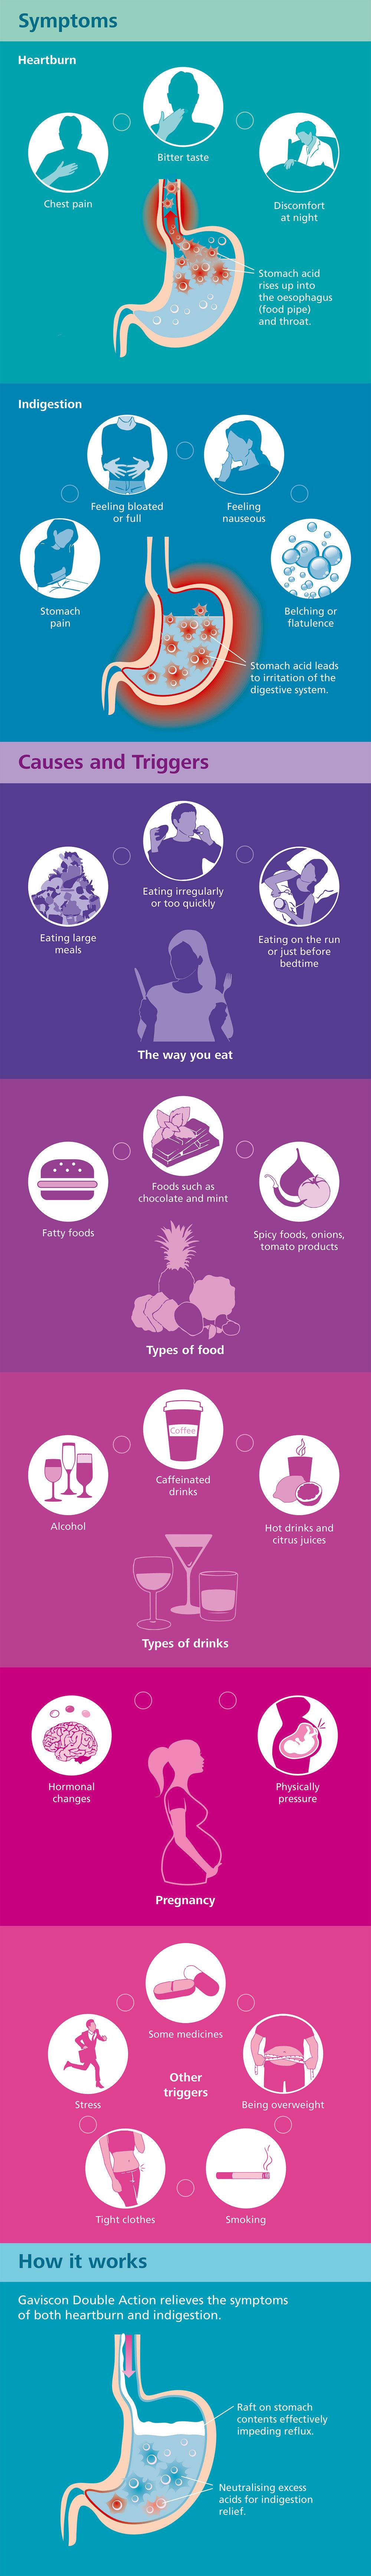 gaviscon_infographic.jpg